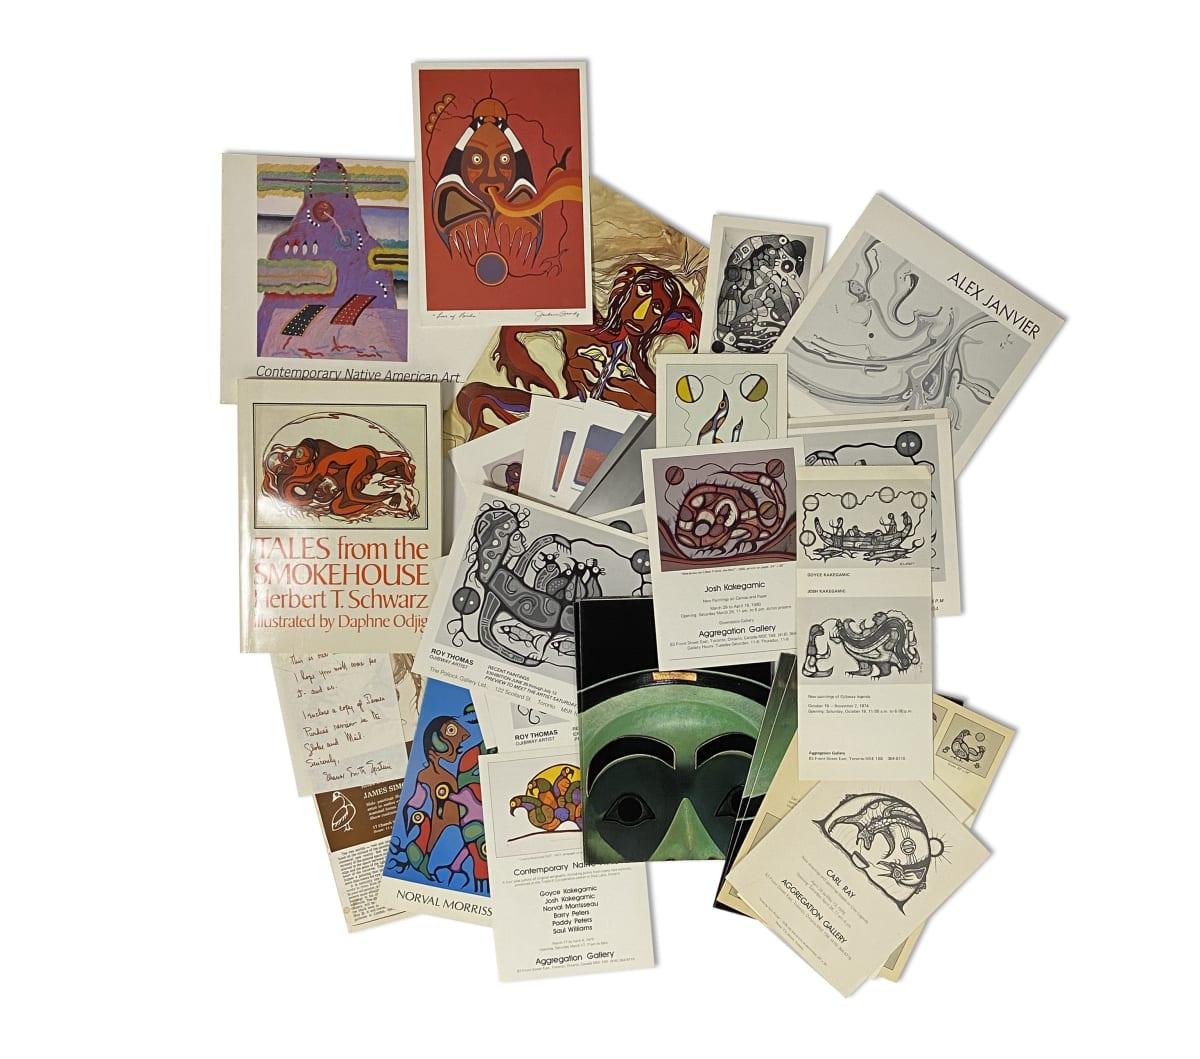 Lot 82 Quantity of Publications and Ephemera Estimate: $200 — $300